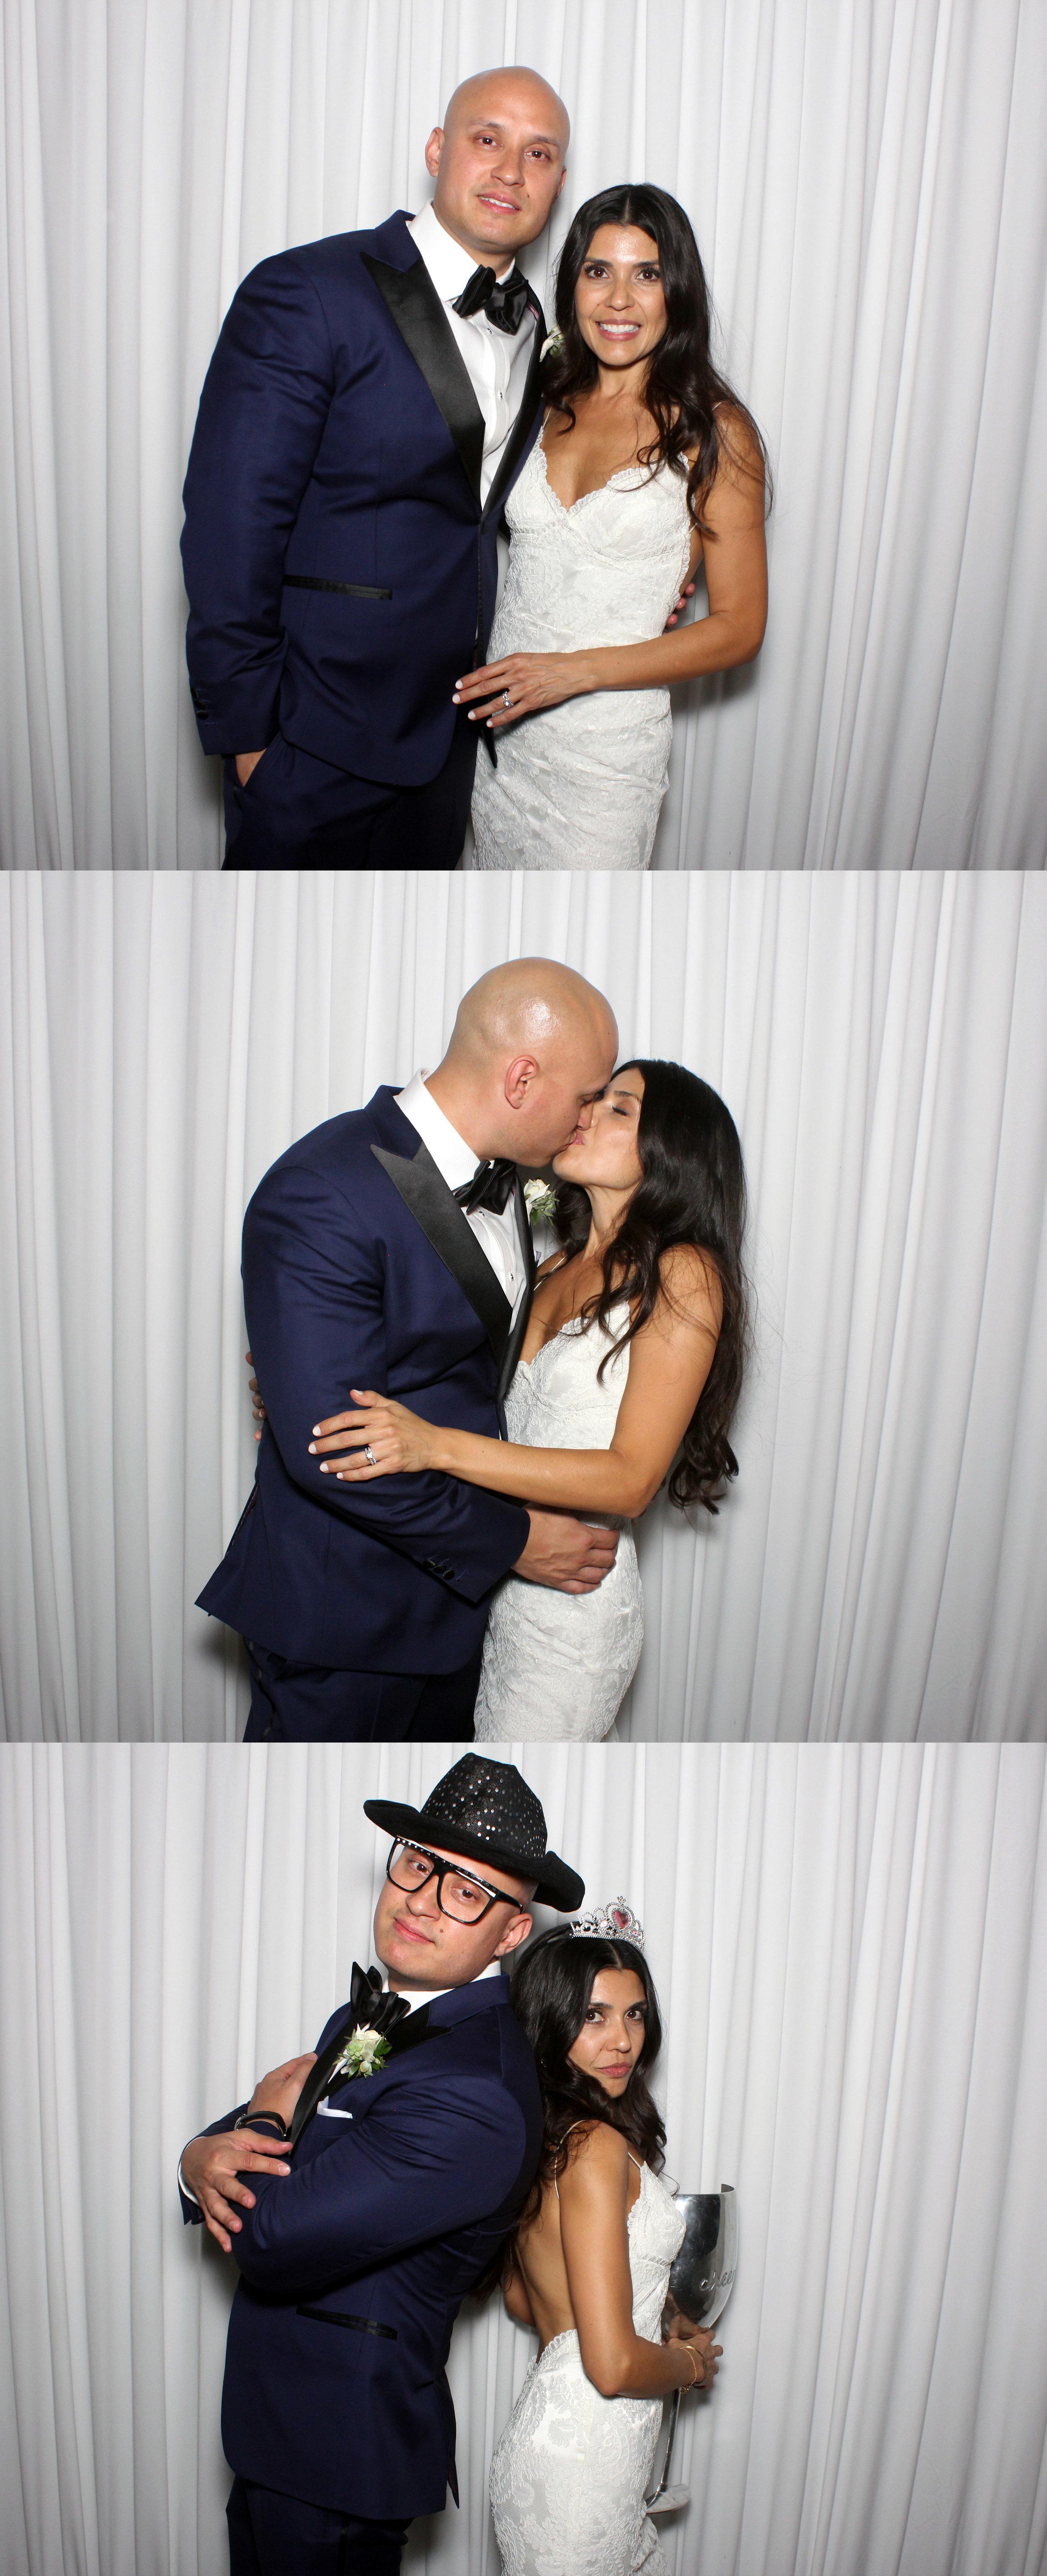 Wedding Photostrip Open Air Photobooth